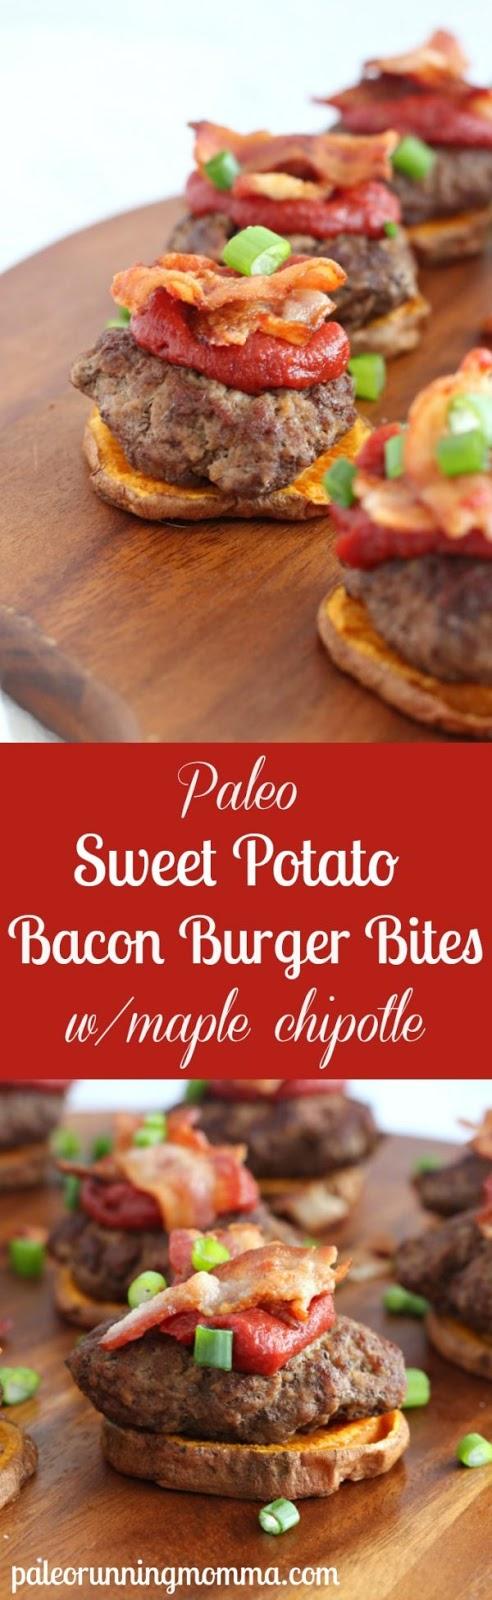 Sweet Potato Bacon Burger Bites with Maple Chipotle